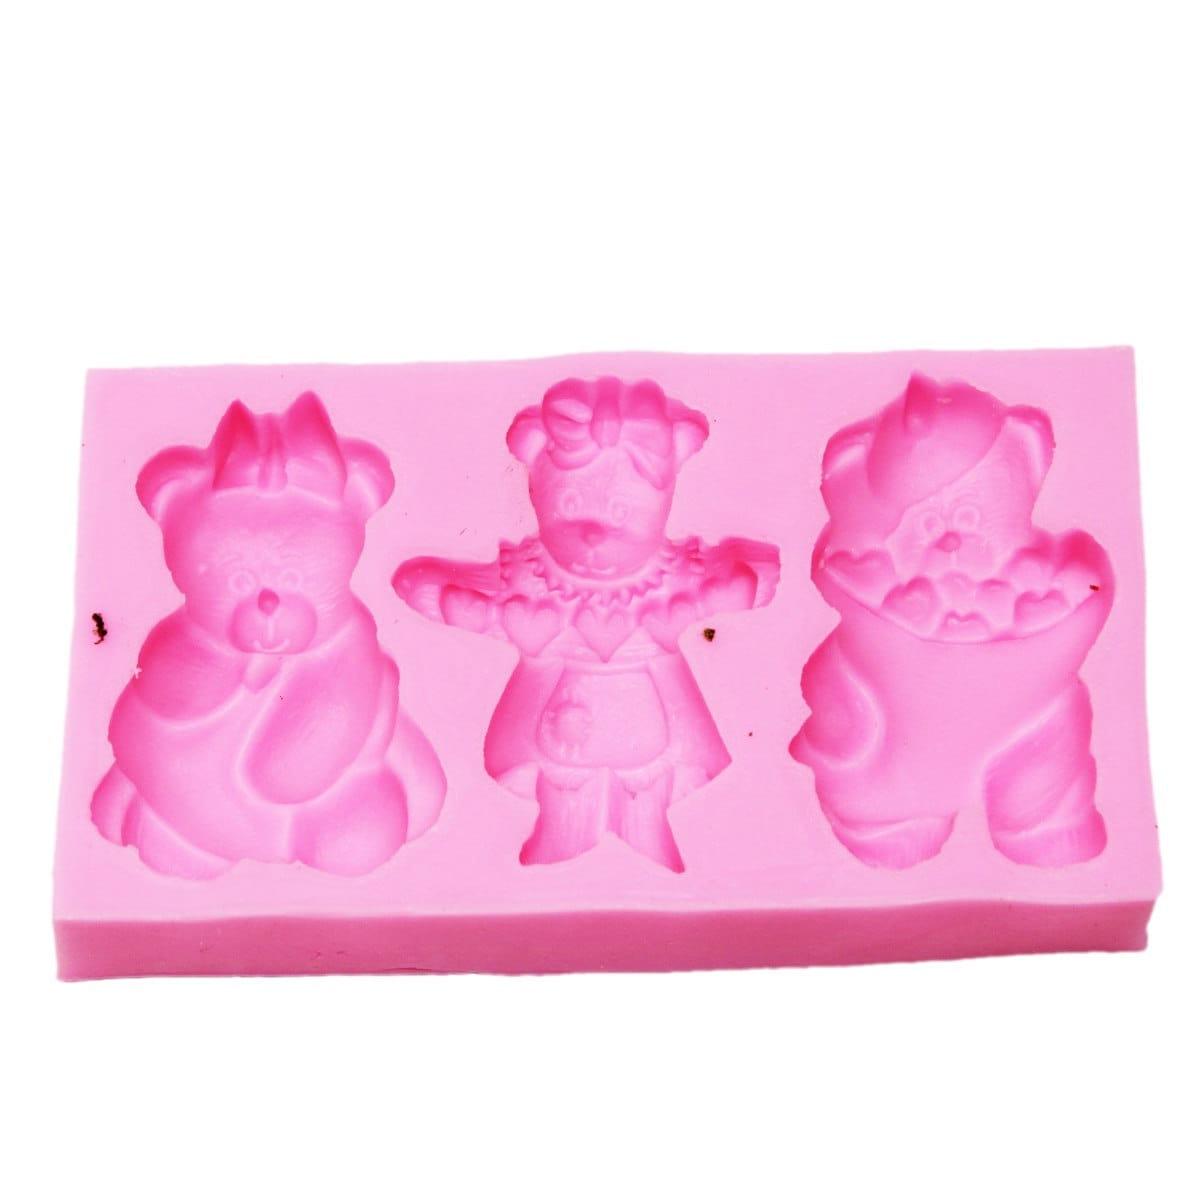 Resin Silicone Mould Birthday Teddy Design